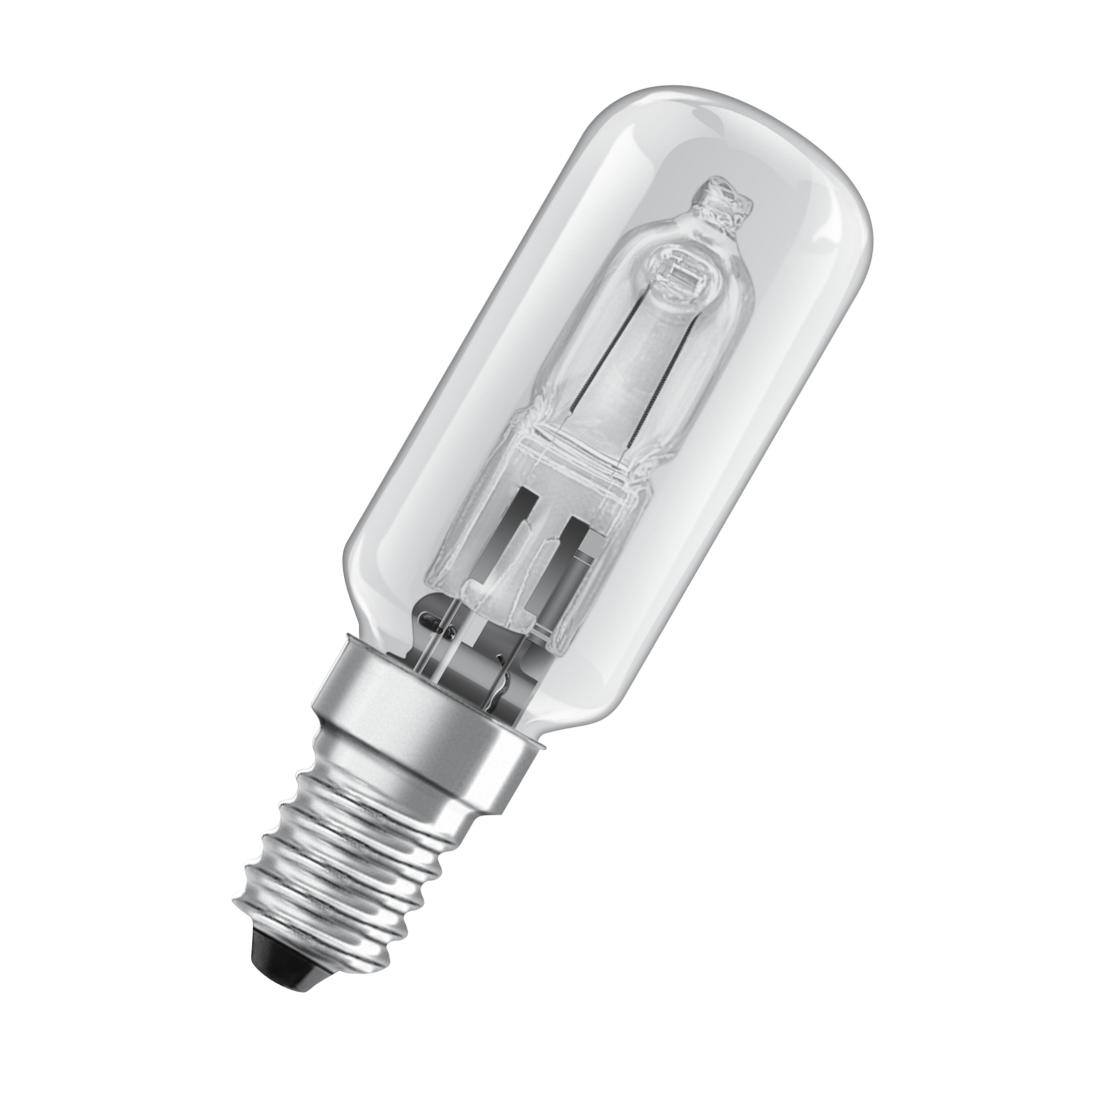 Hotte Aspirante Tube tout xavax.eu | 00112439 xavax lampe halogène pour hotte aspirante, 25w